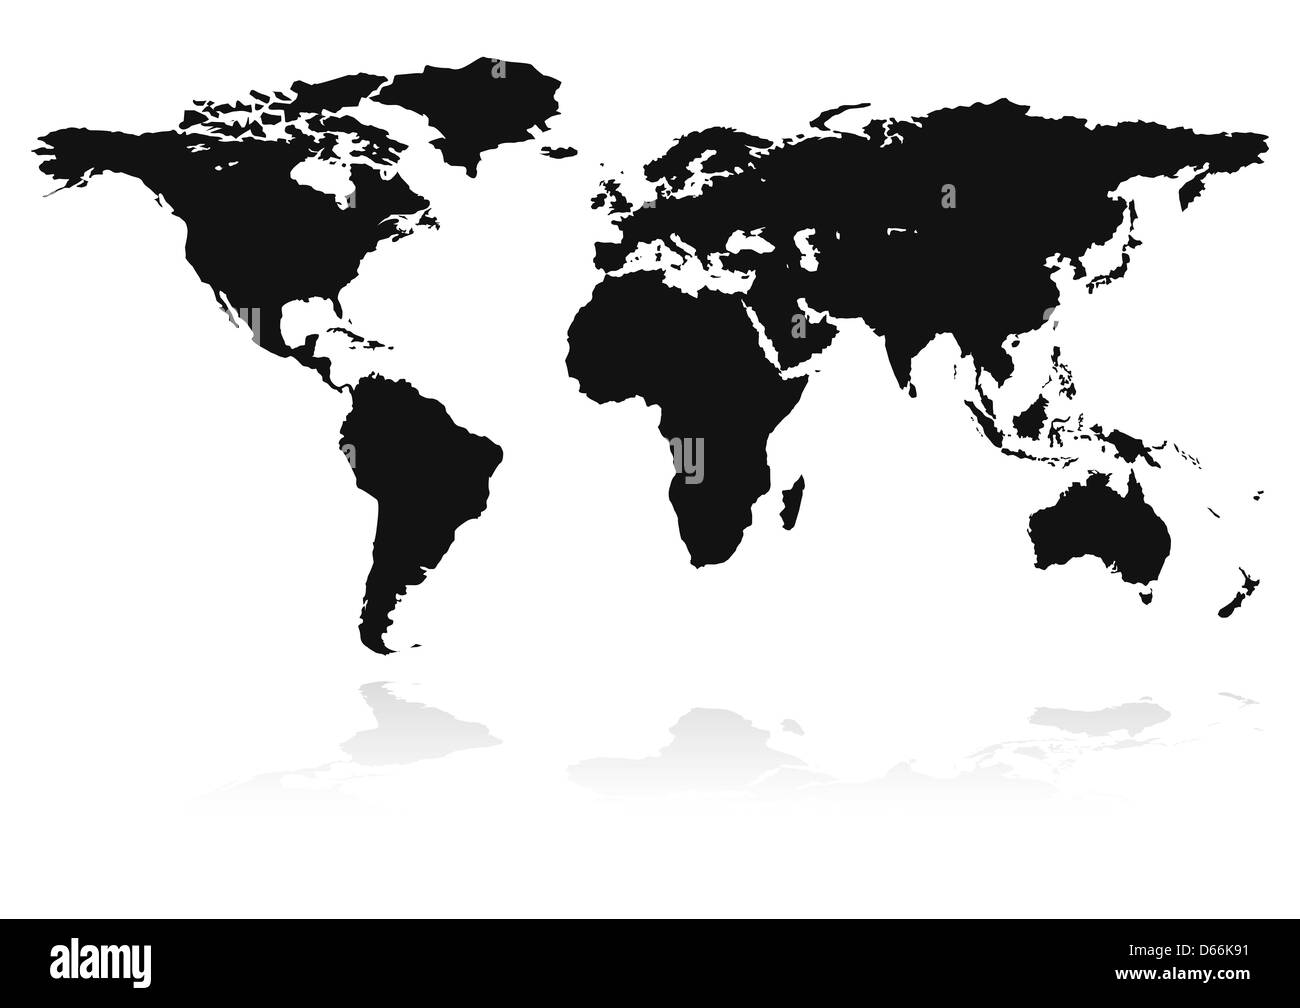 World map black and white countries imgenes de stock world map silueta de pases sobre blanco mapa del mundo imagen de stock gumiabroncs Choice Image